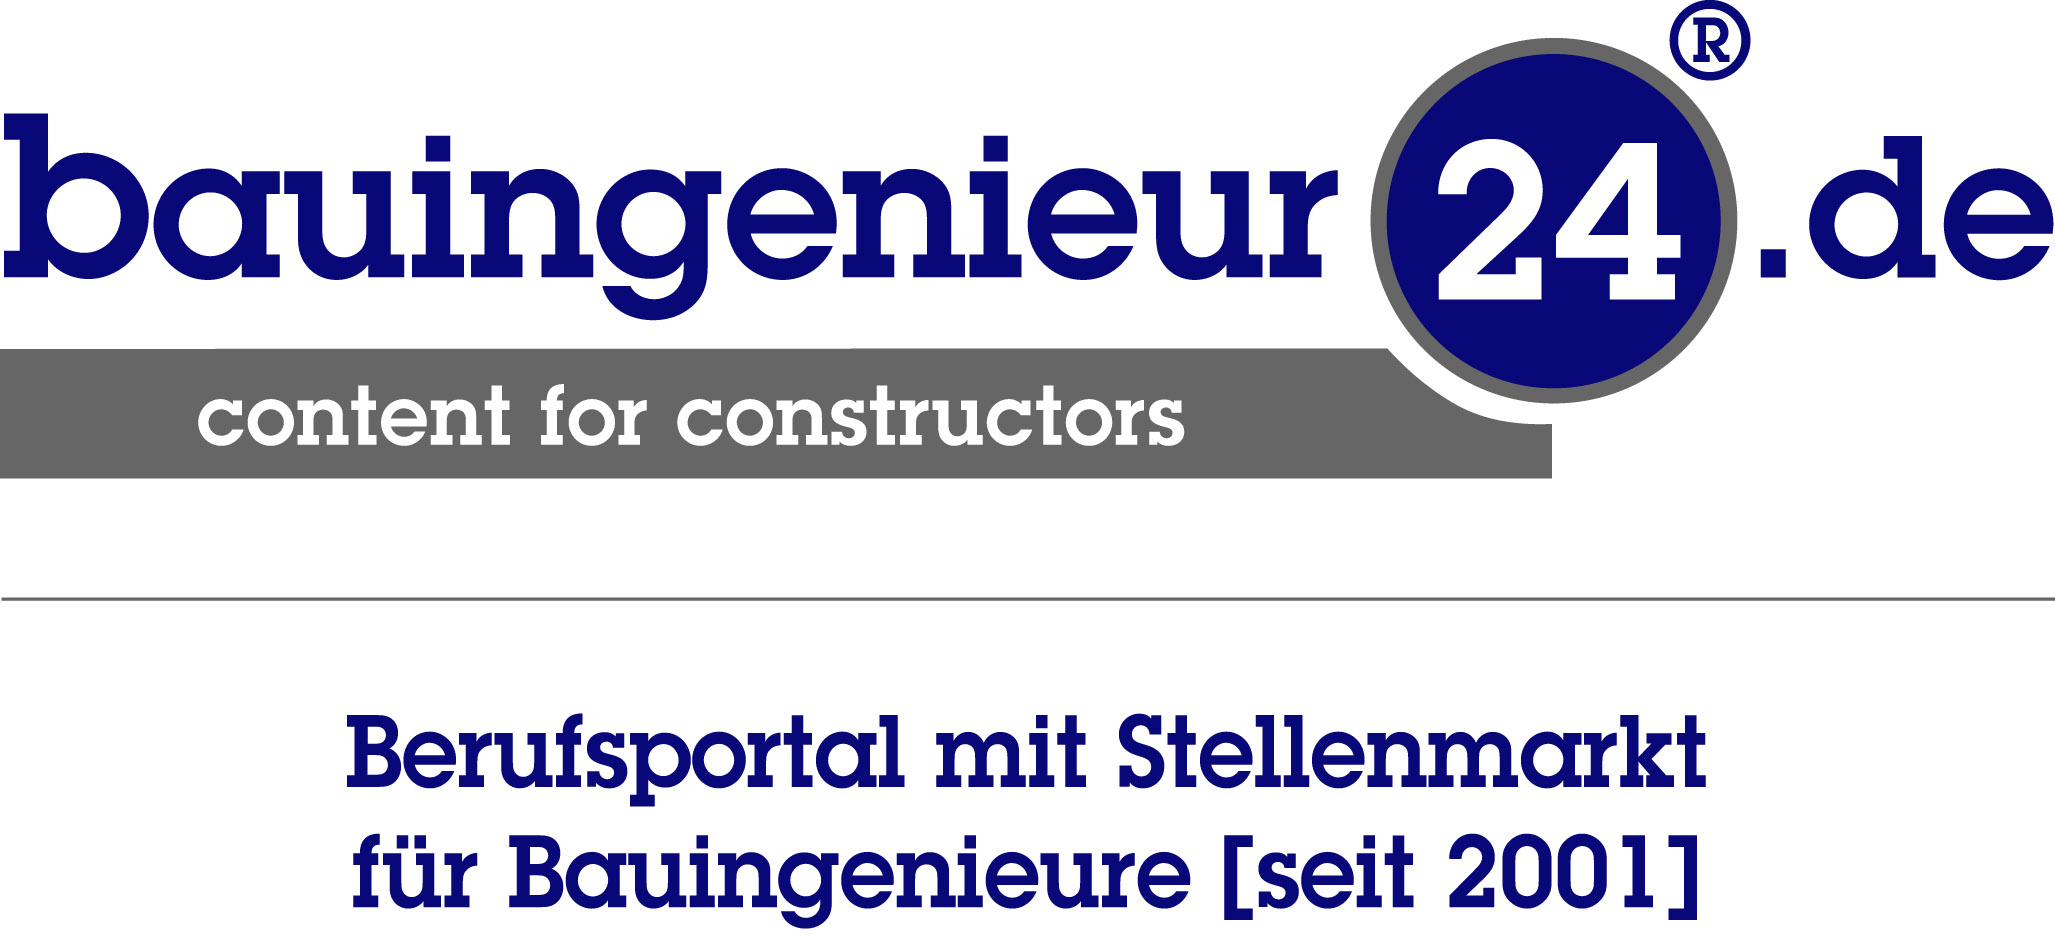 Logo mit Slogan bauingenieur24.de